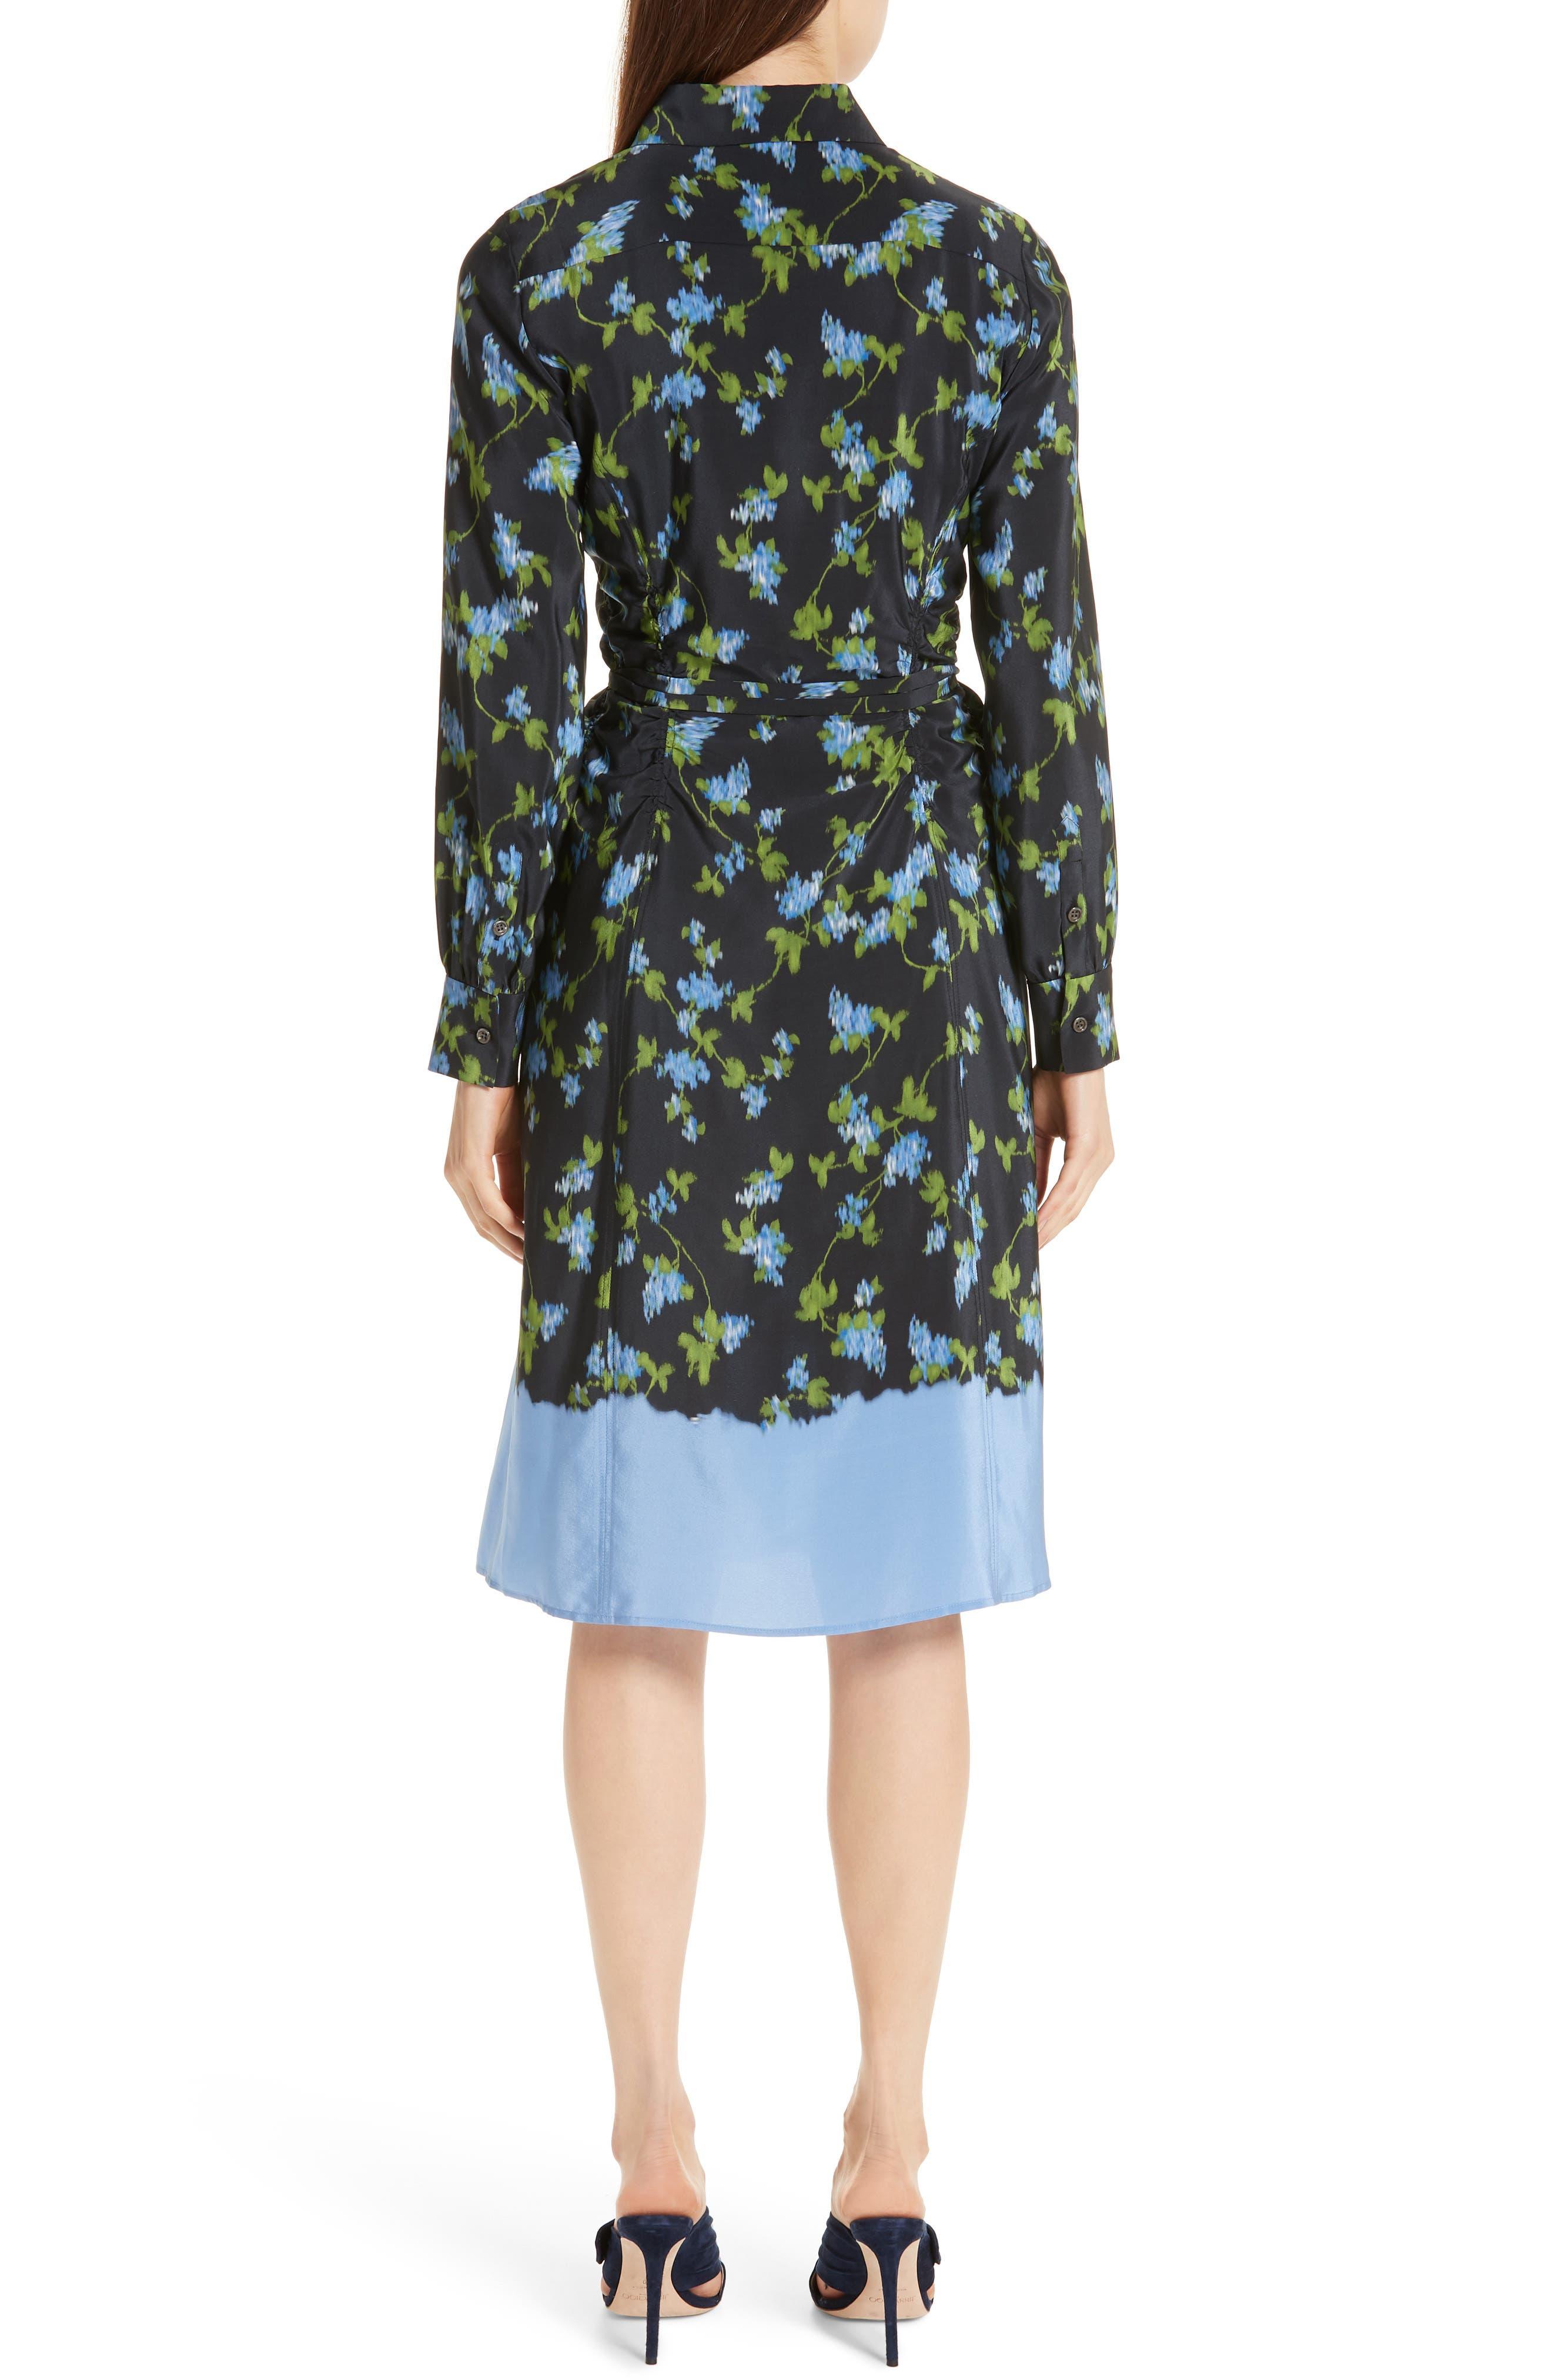 ALTUZARRA, Floral Print Silk Dress, Alternate thumbnail 2, color, BLACK